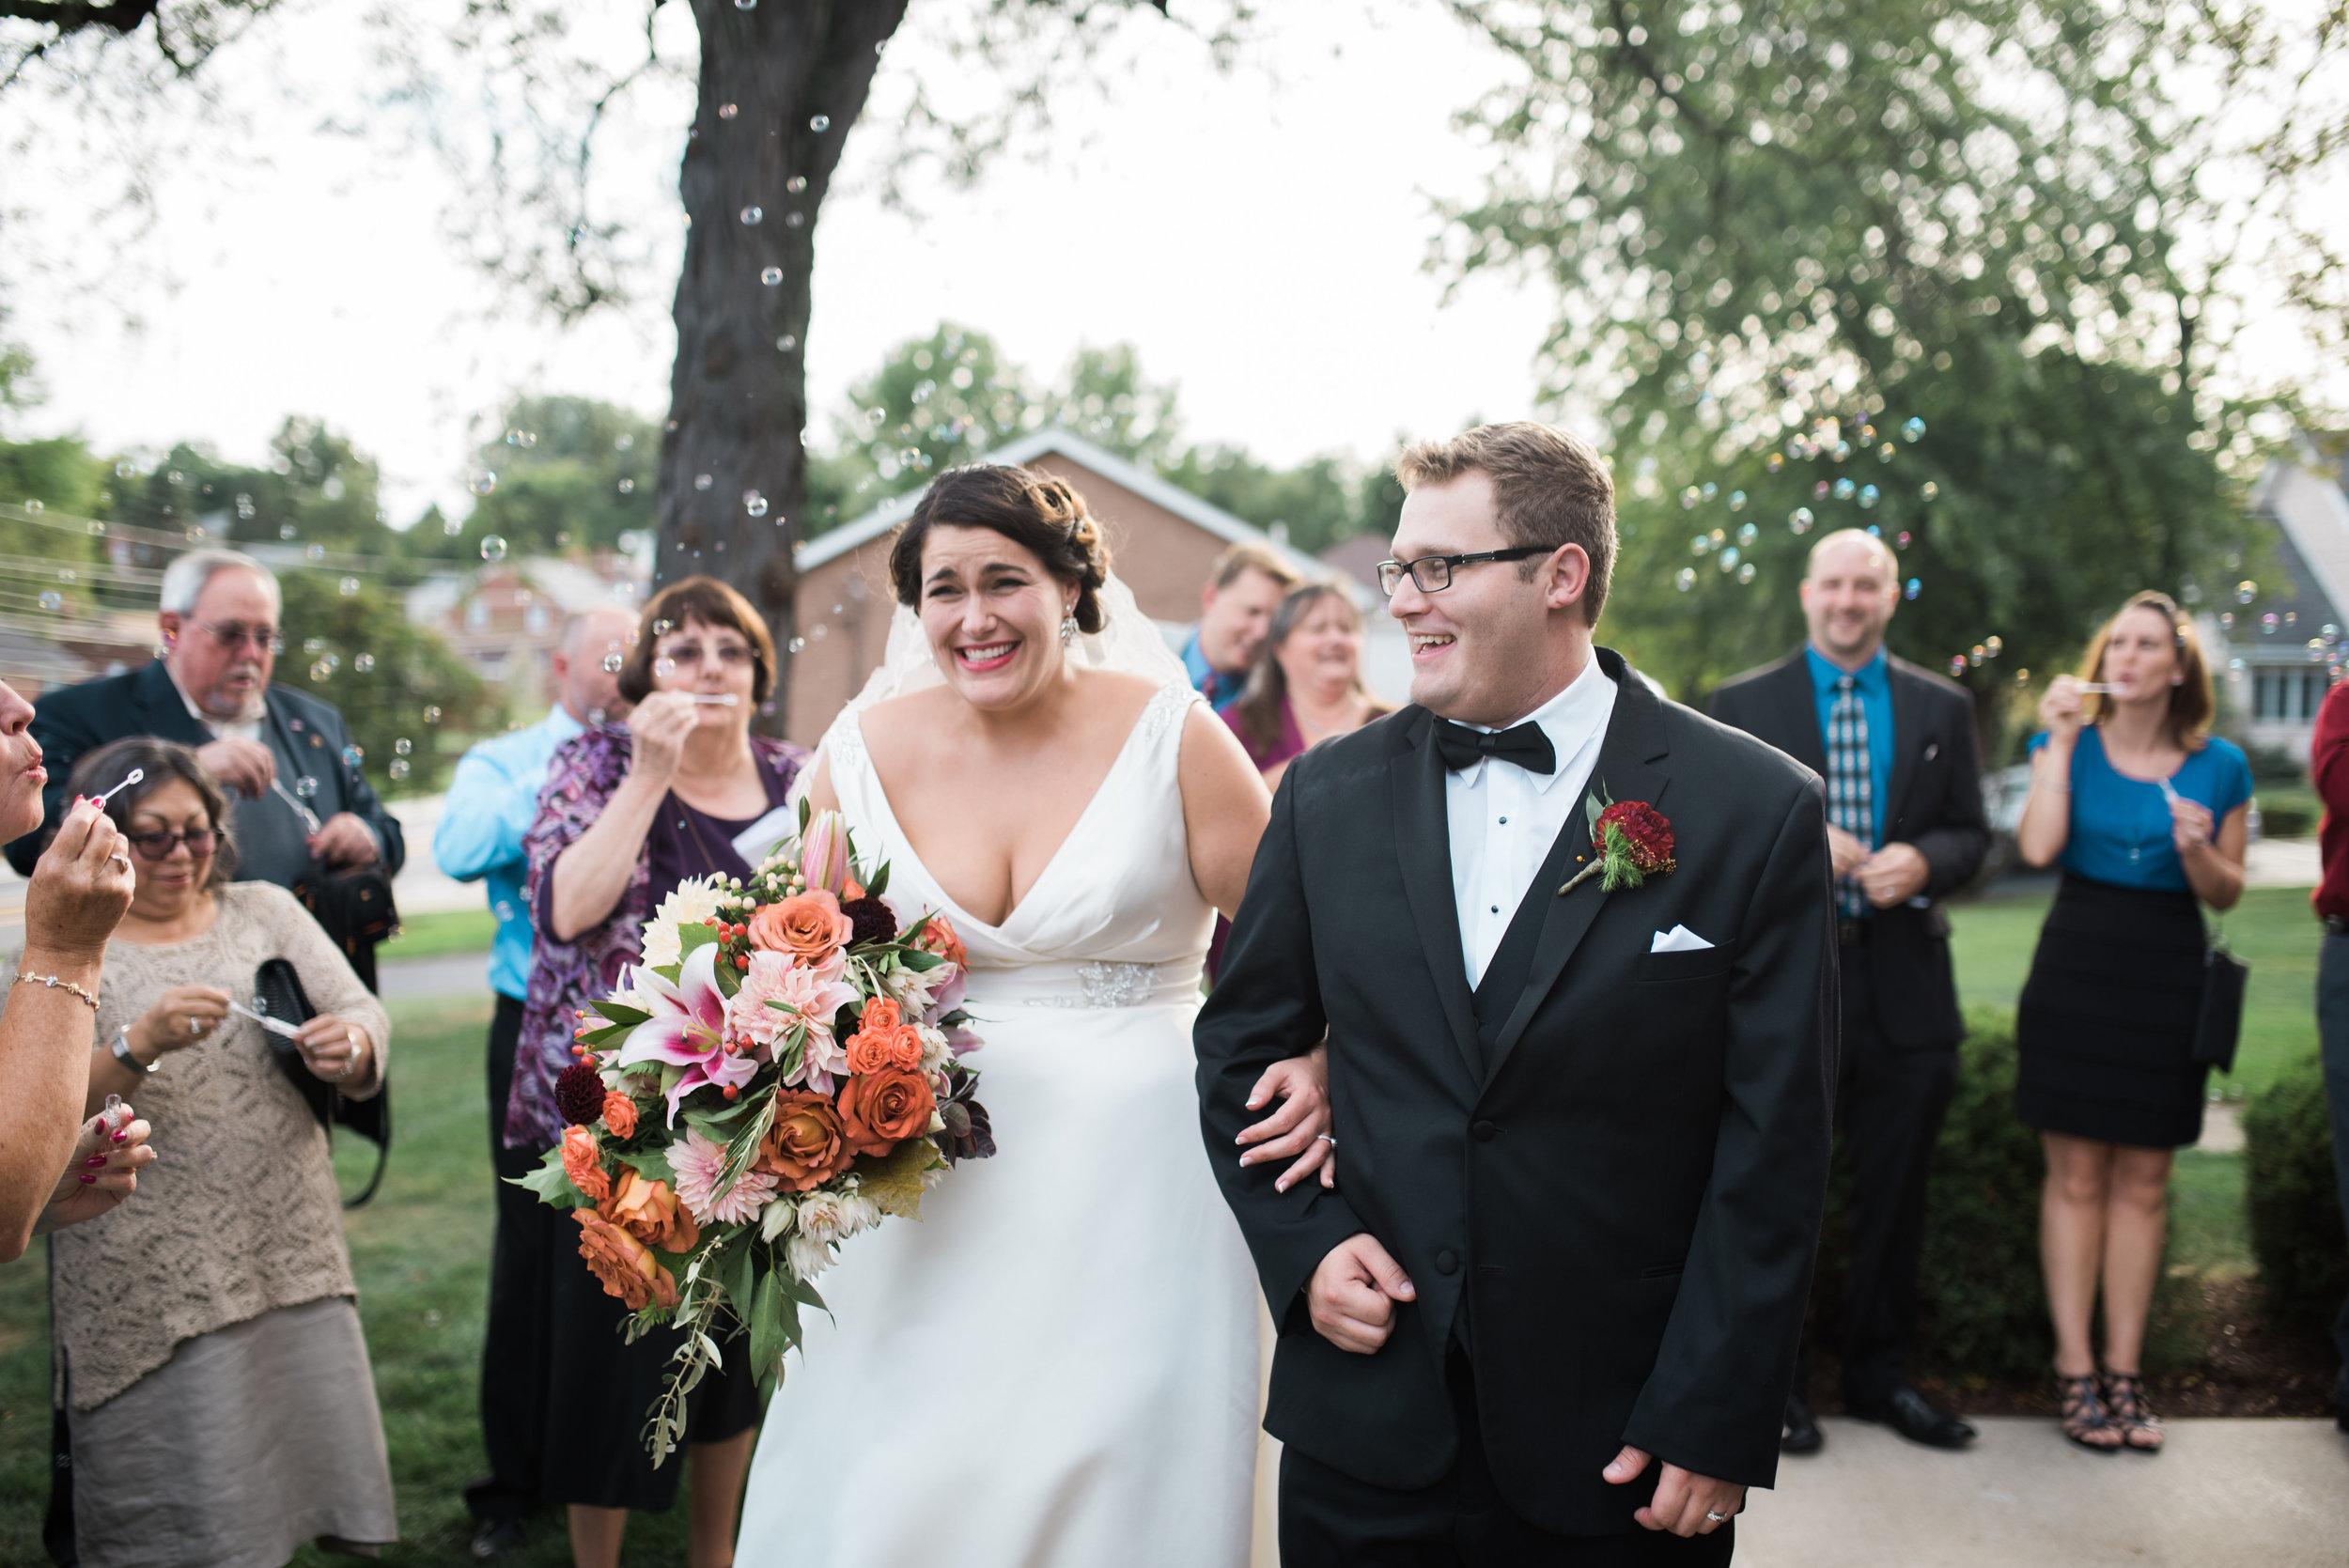 wedding day walking down the aisle, wedding photographer